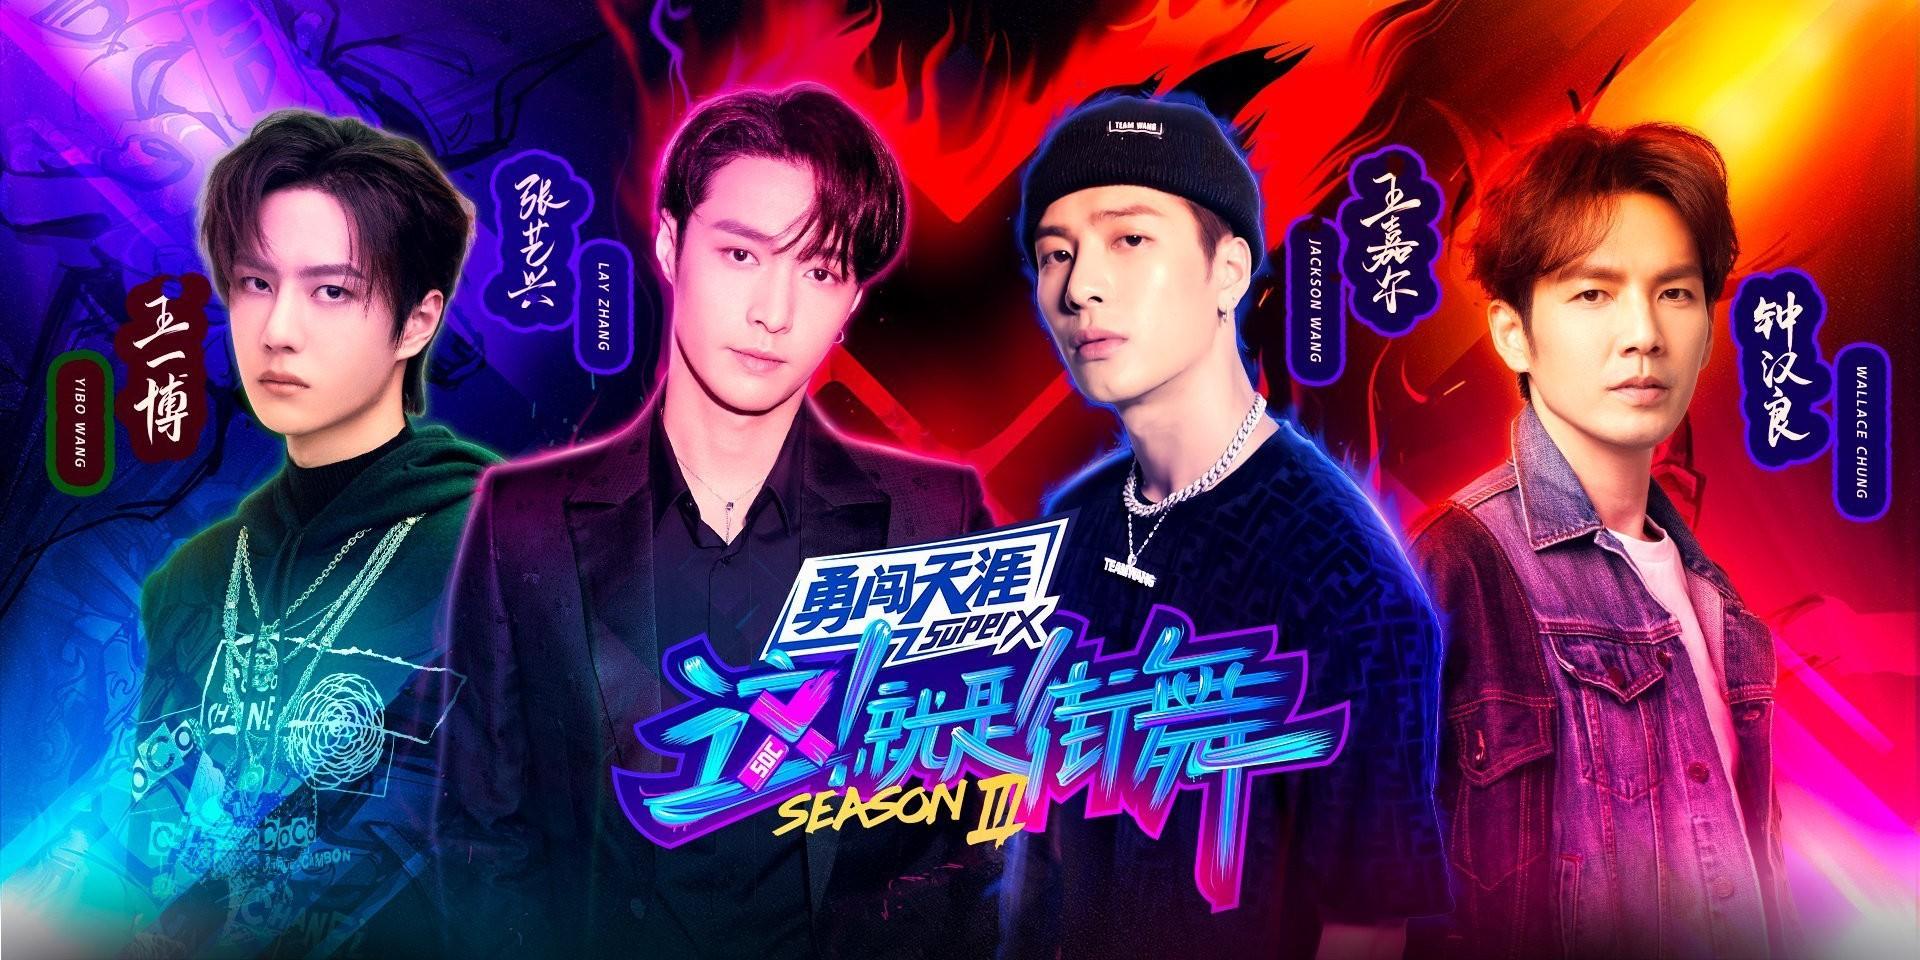 YouKu takes Street Dance of China Season 3 to YouTube with Wang Yibo, Jackson Wang, Lay Zhang, and Wallace Chung – watch